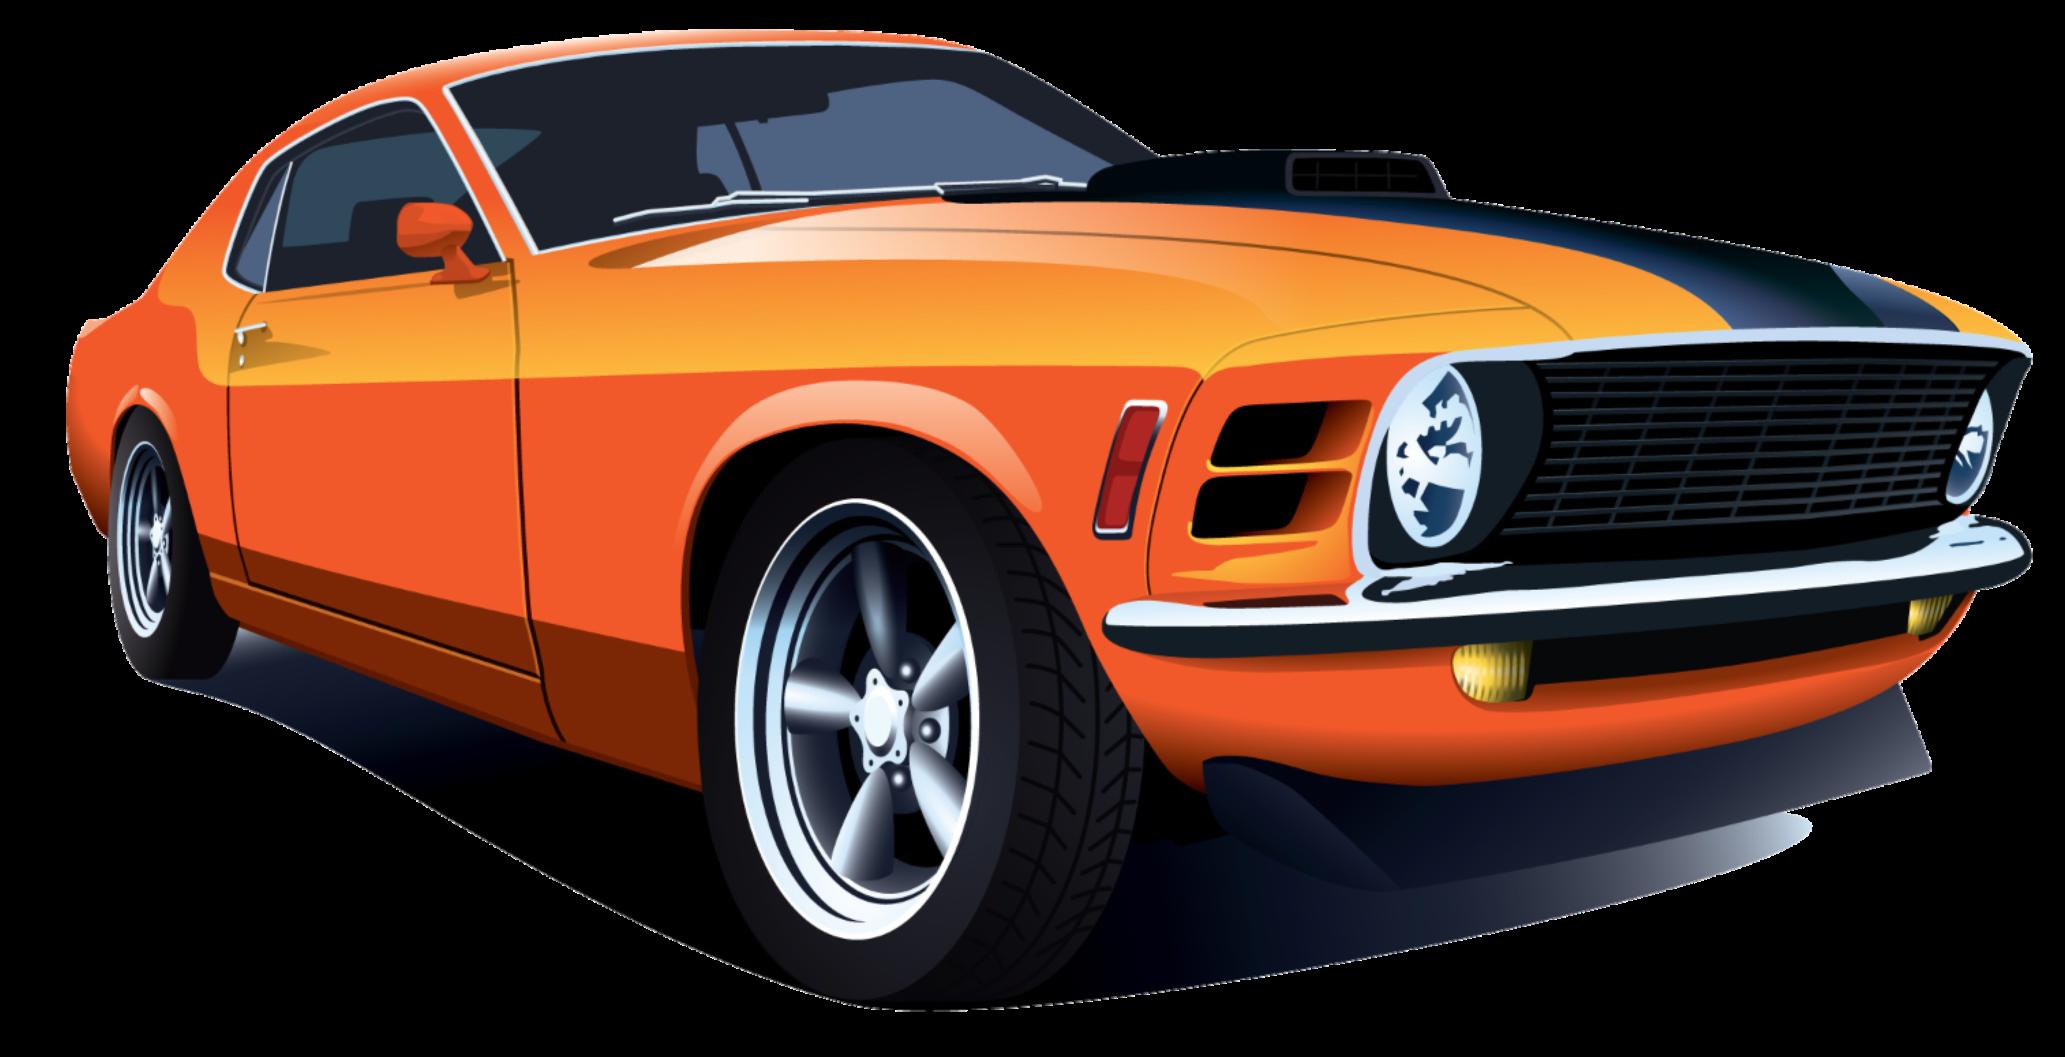 Steel City Garage :: Used Classic Cars Pueblo CO.